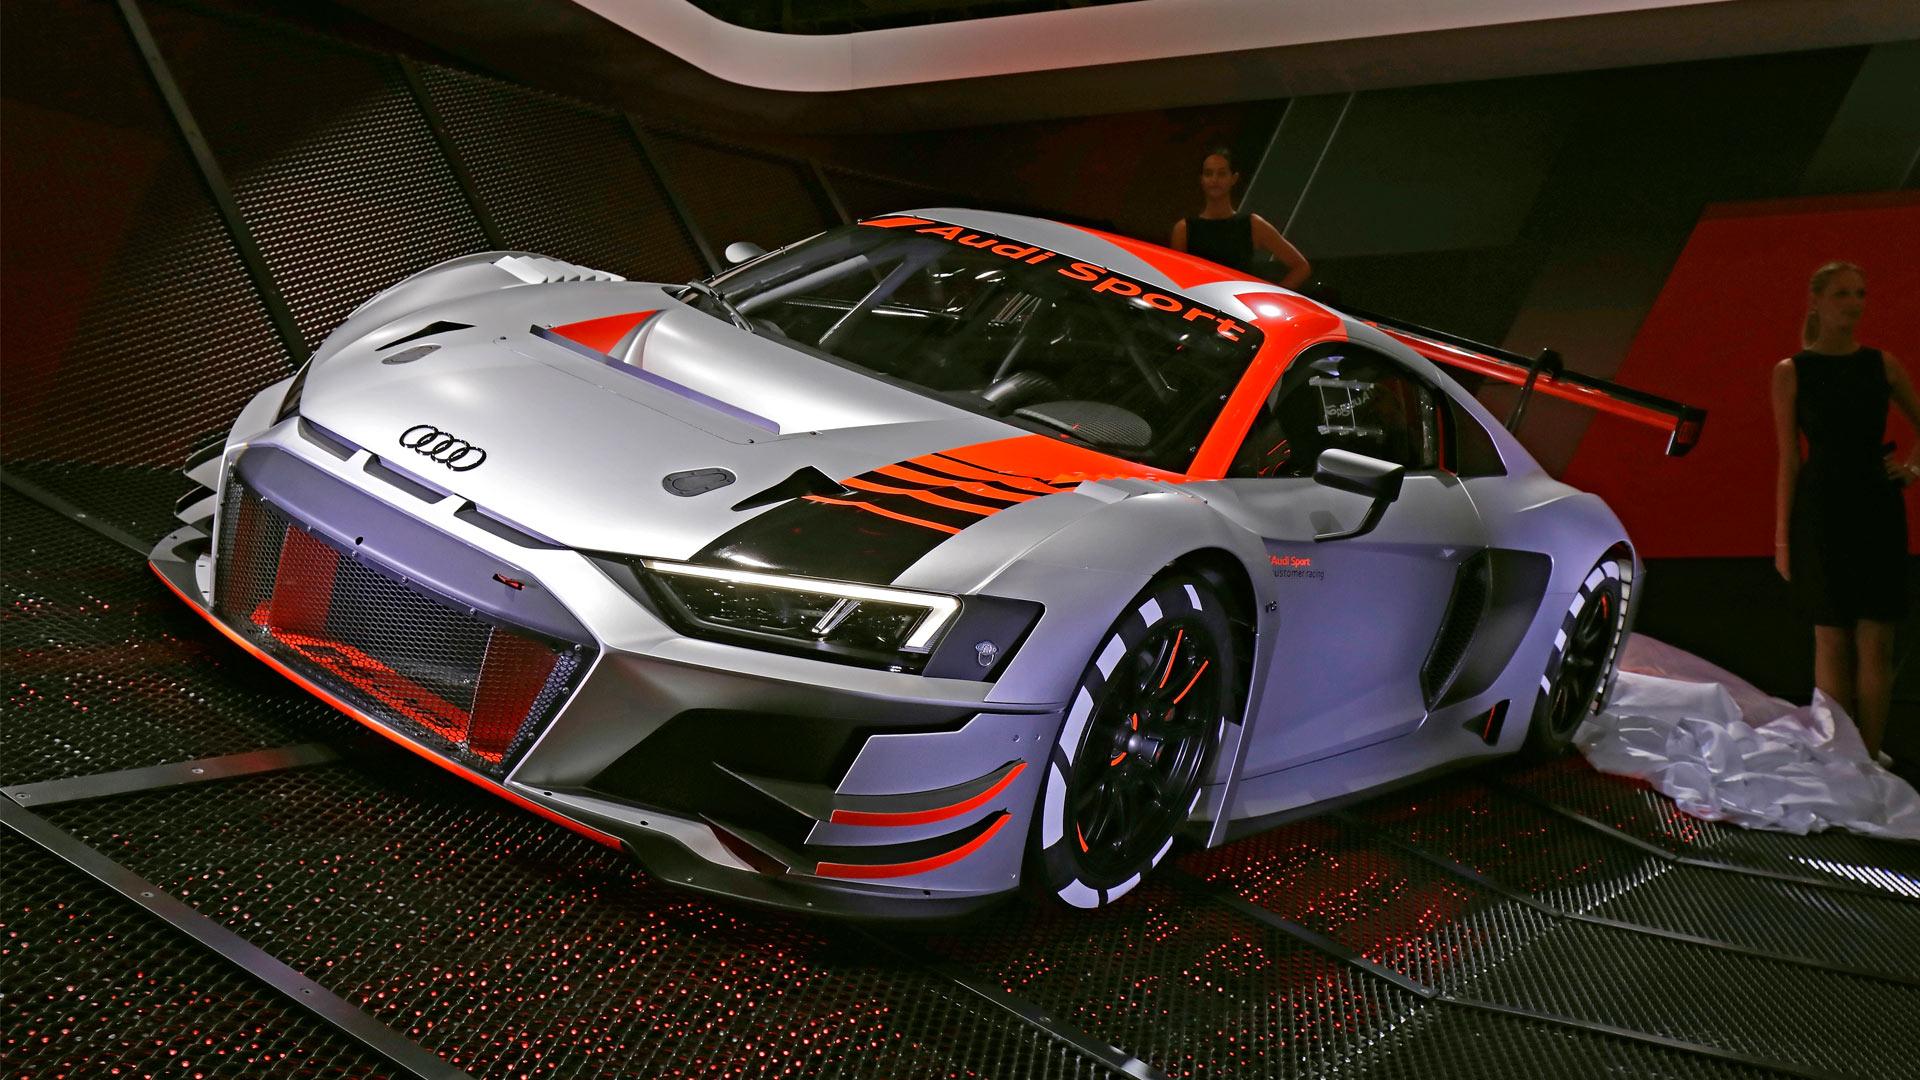 2019 Audi R8 Lms Gt3 Is Lighter Stiffer And Angrier Autodevot